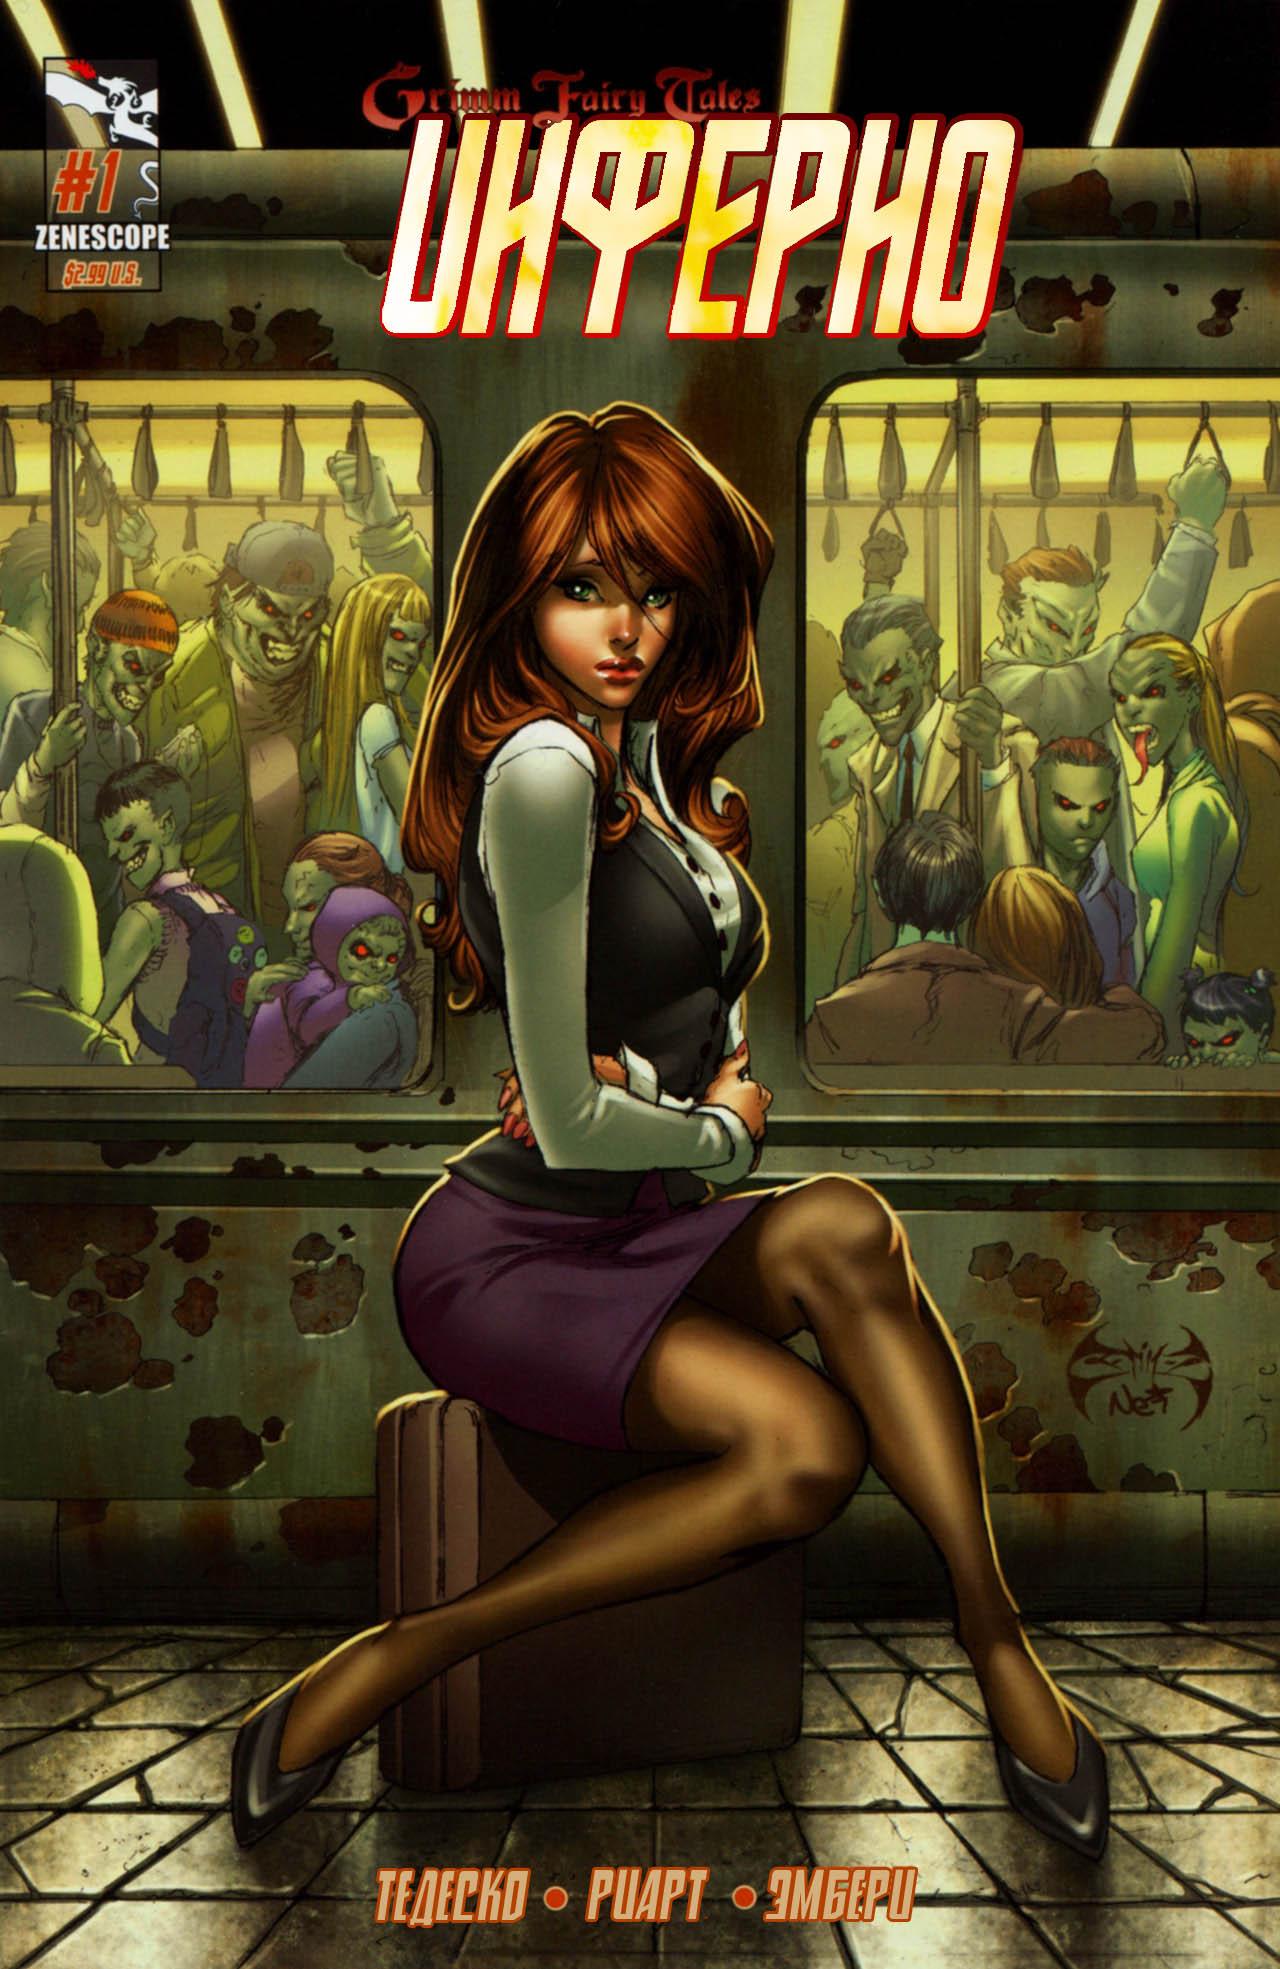 Catwoman rule rule 34xxx porn image